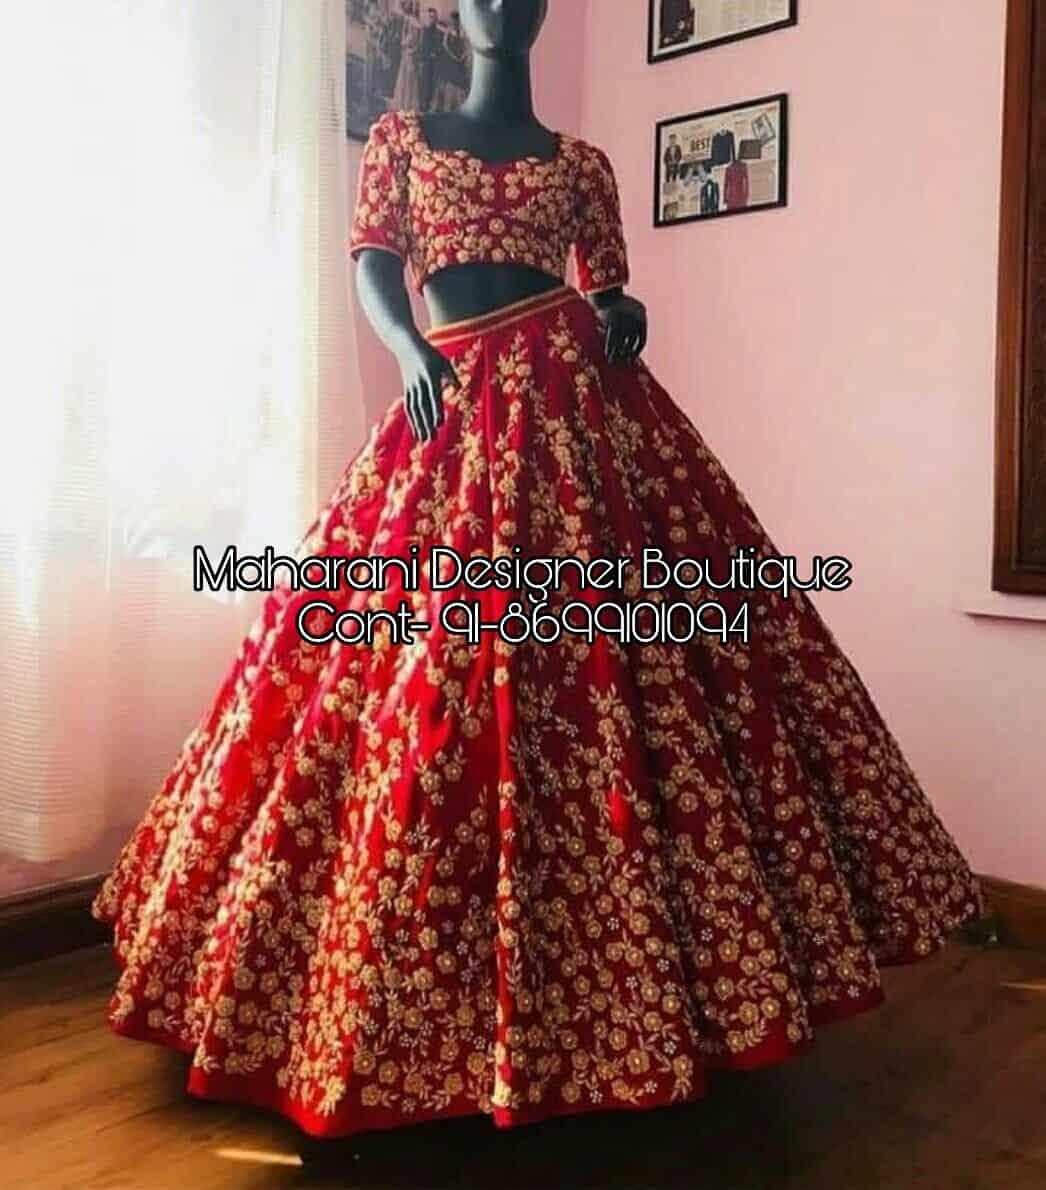 eeac189912 bridal lehenga online boutique, bridal lehenga online boutique, designer lehenga  boutique online, lehenga